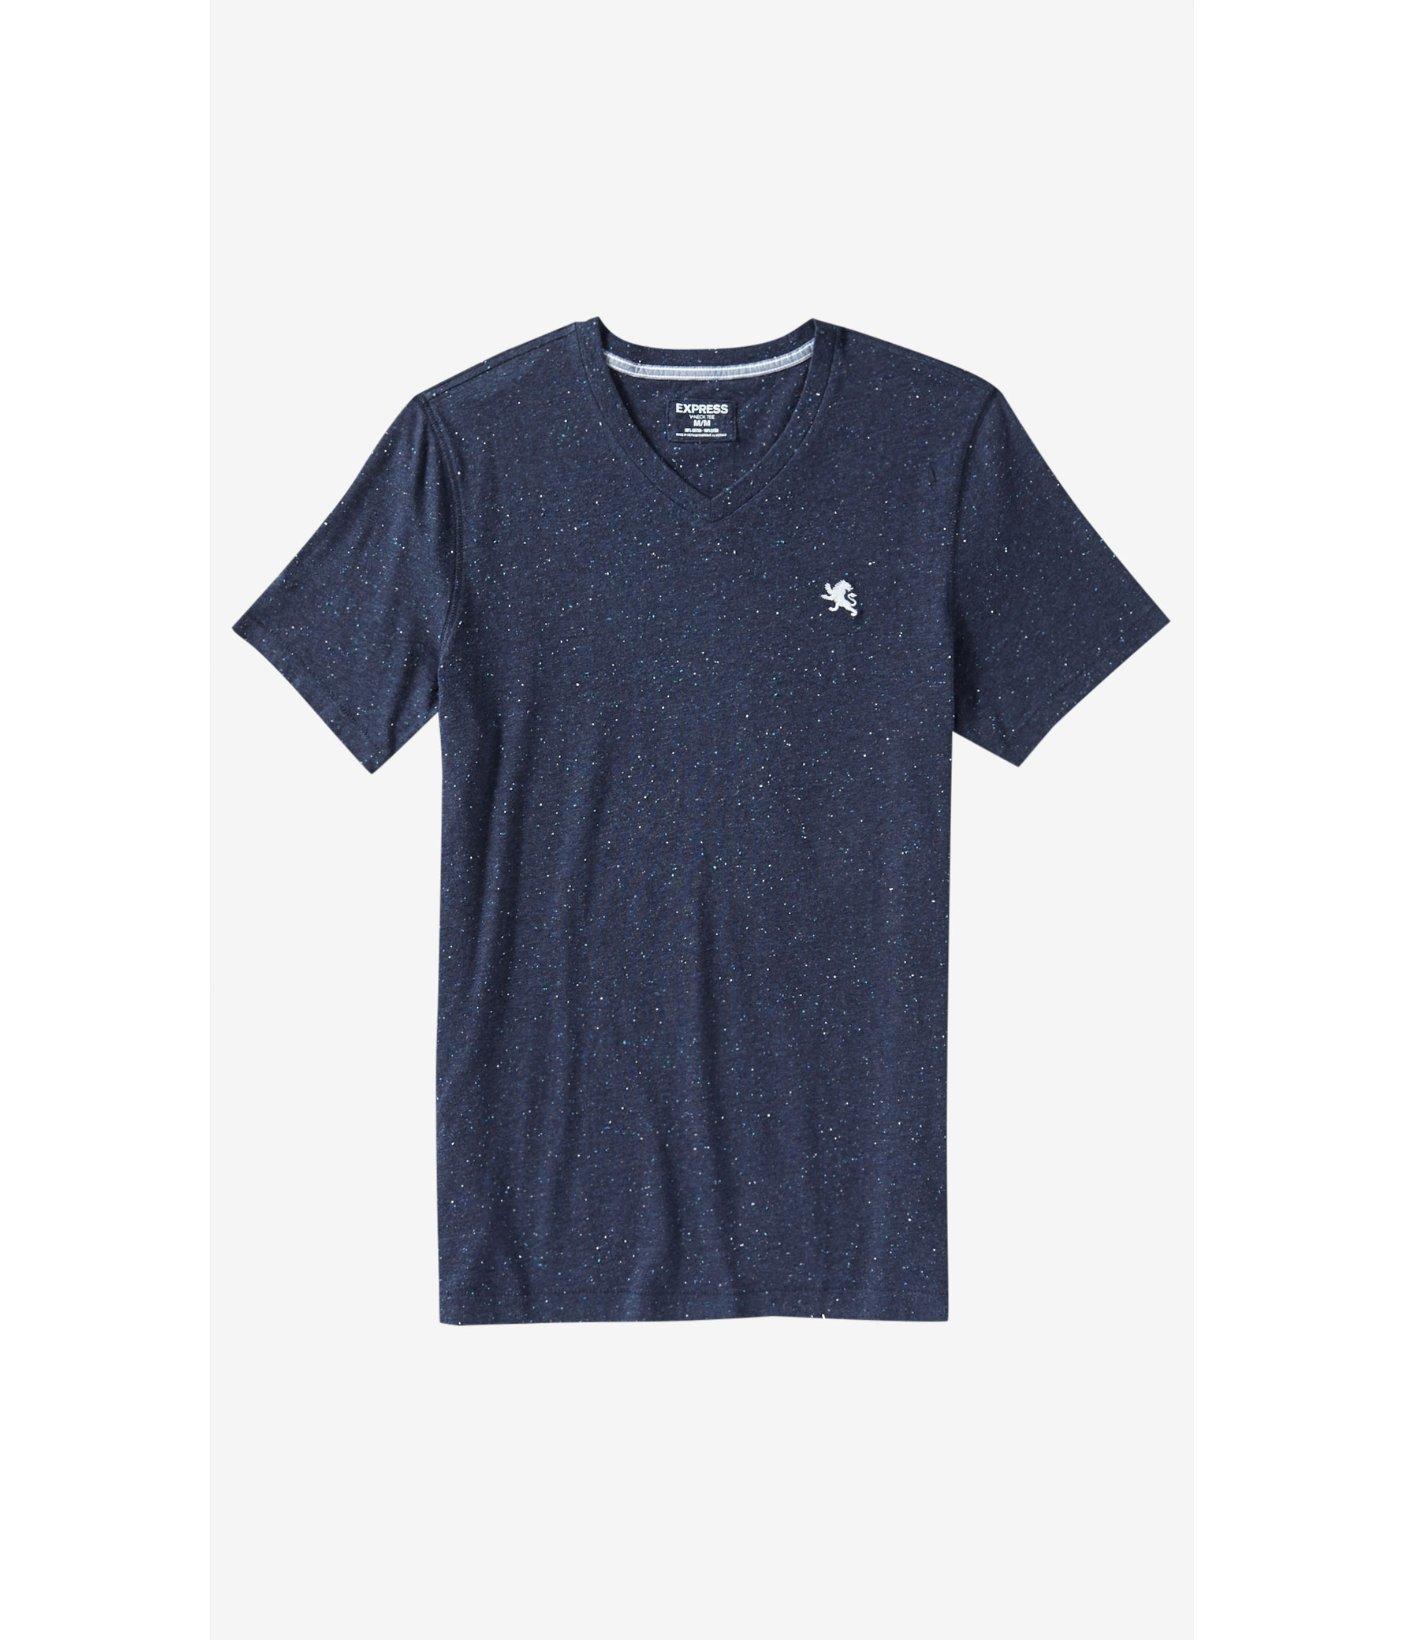 d7472edce7a Original Lacoste Polo Shirt Vs Fake